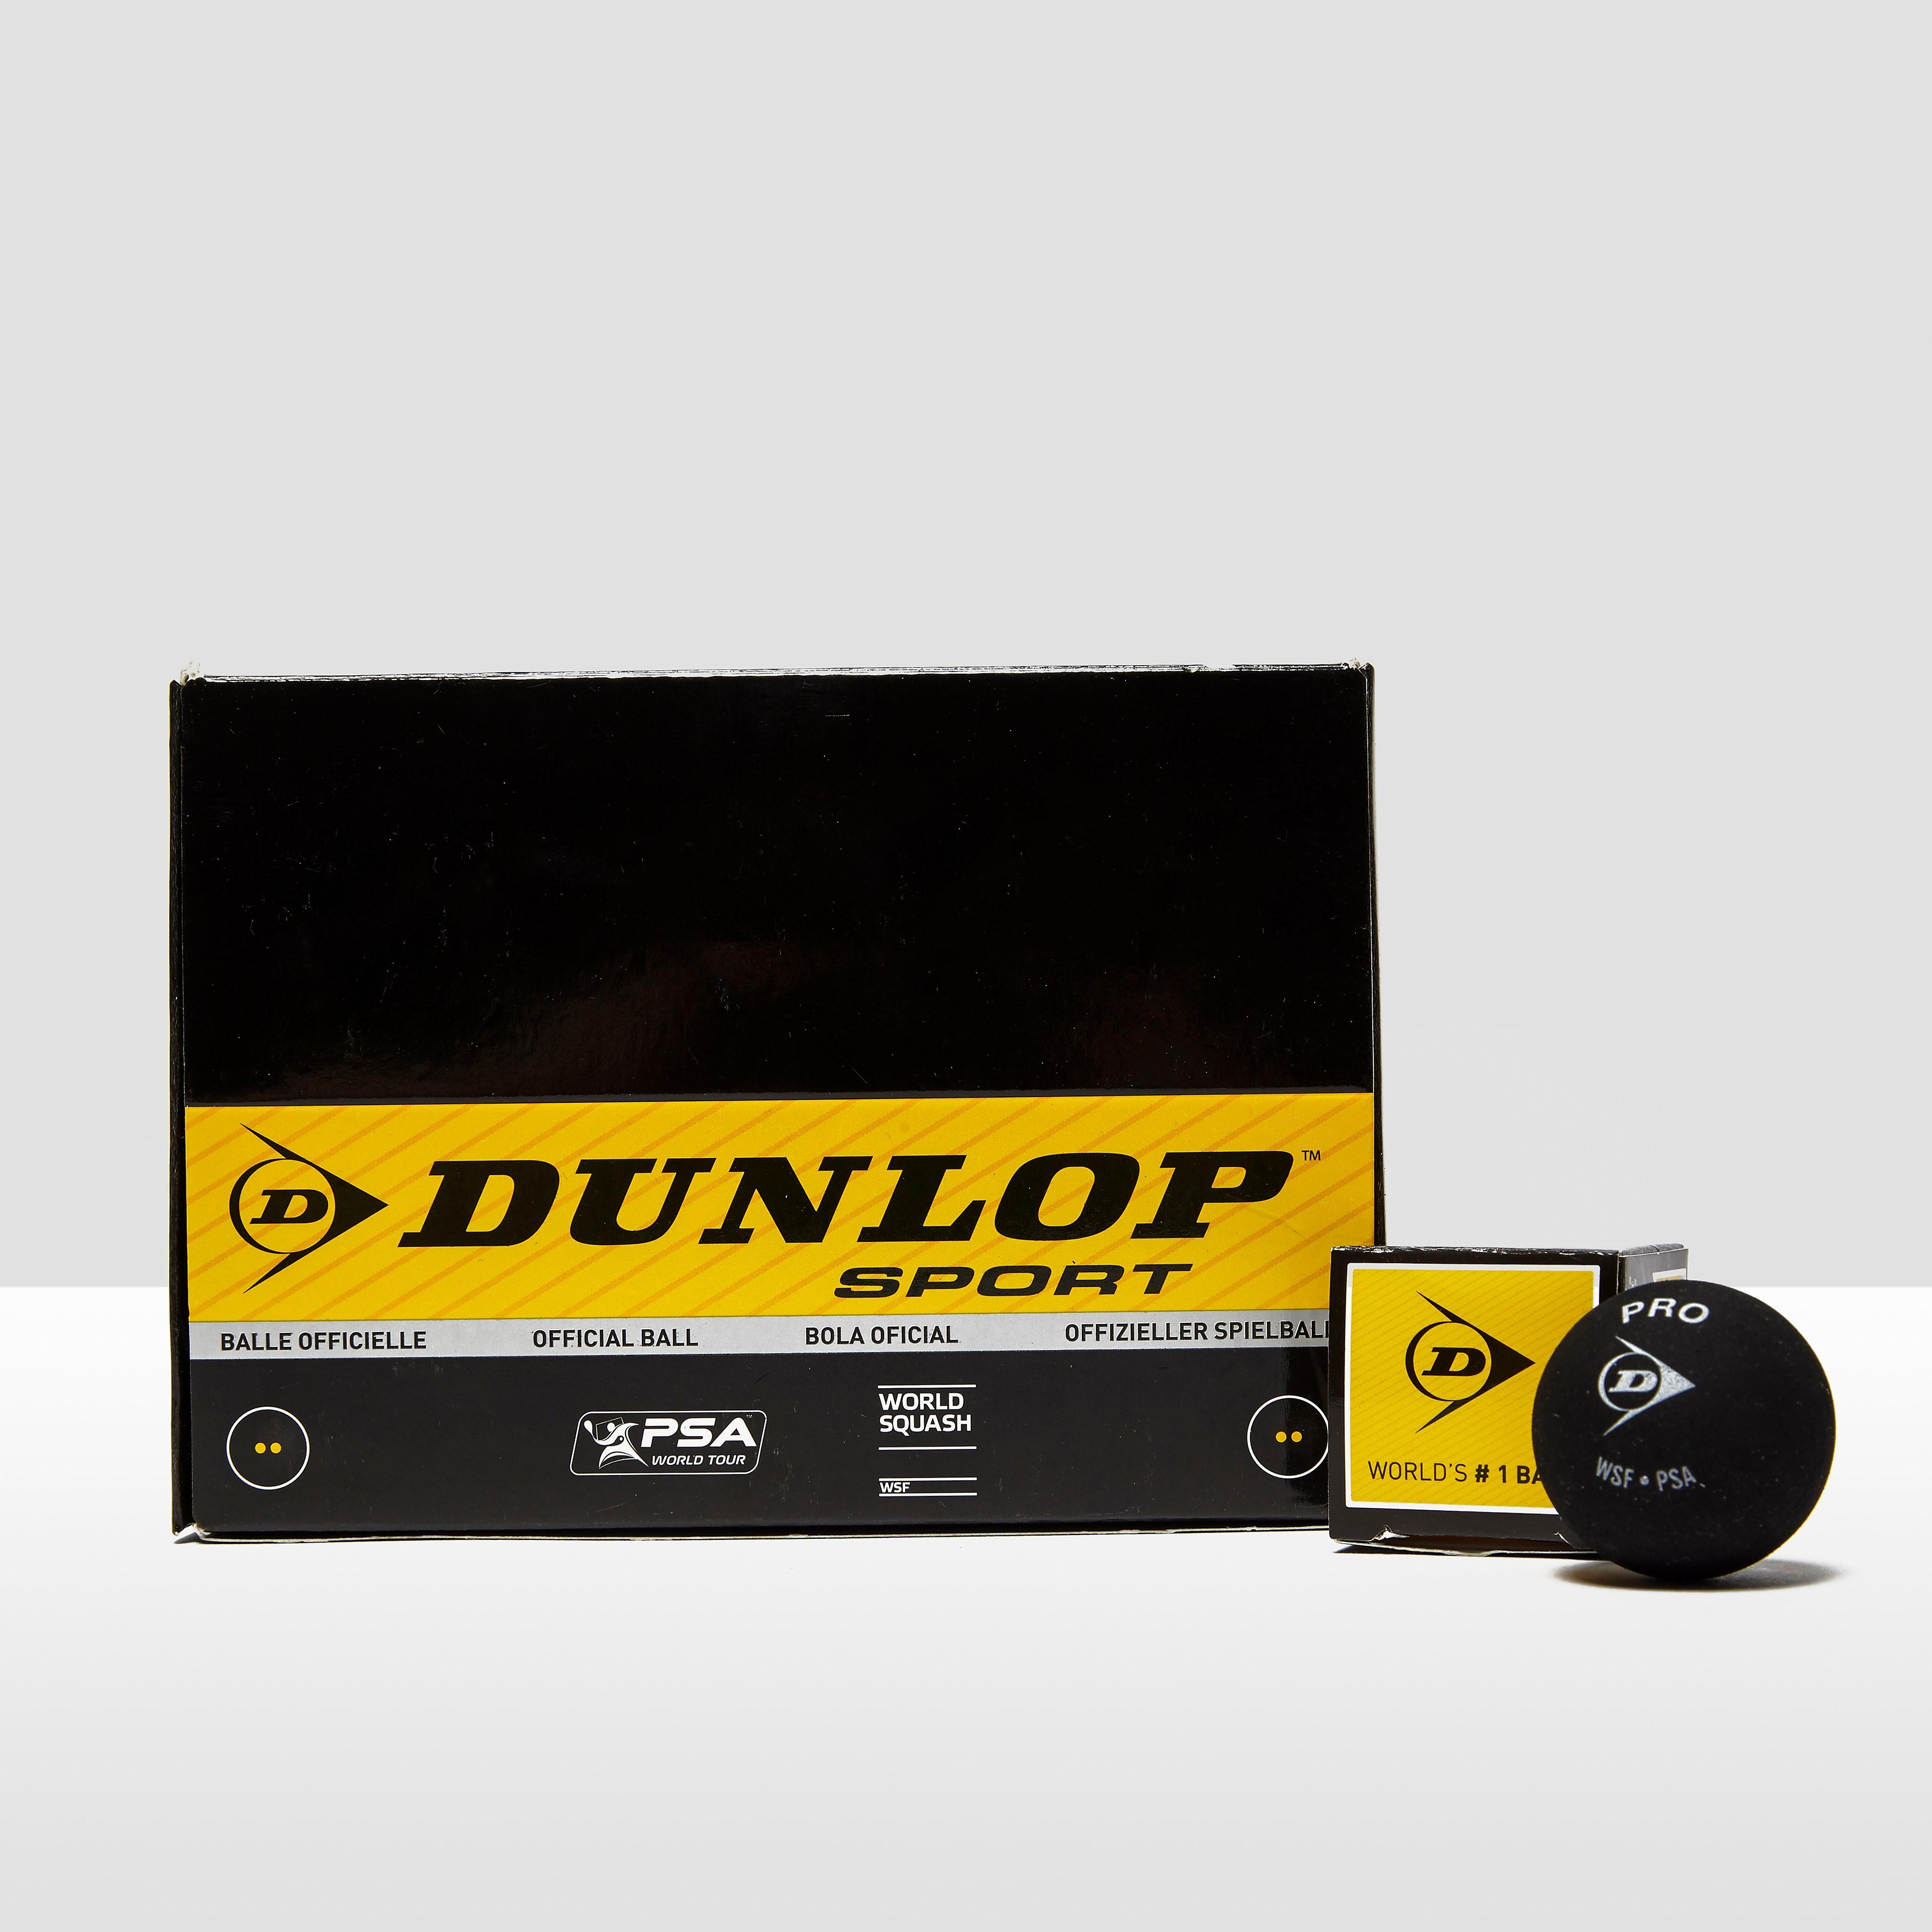 Dunlop Pro Squash Balls (Double Spot) - Box of 12